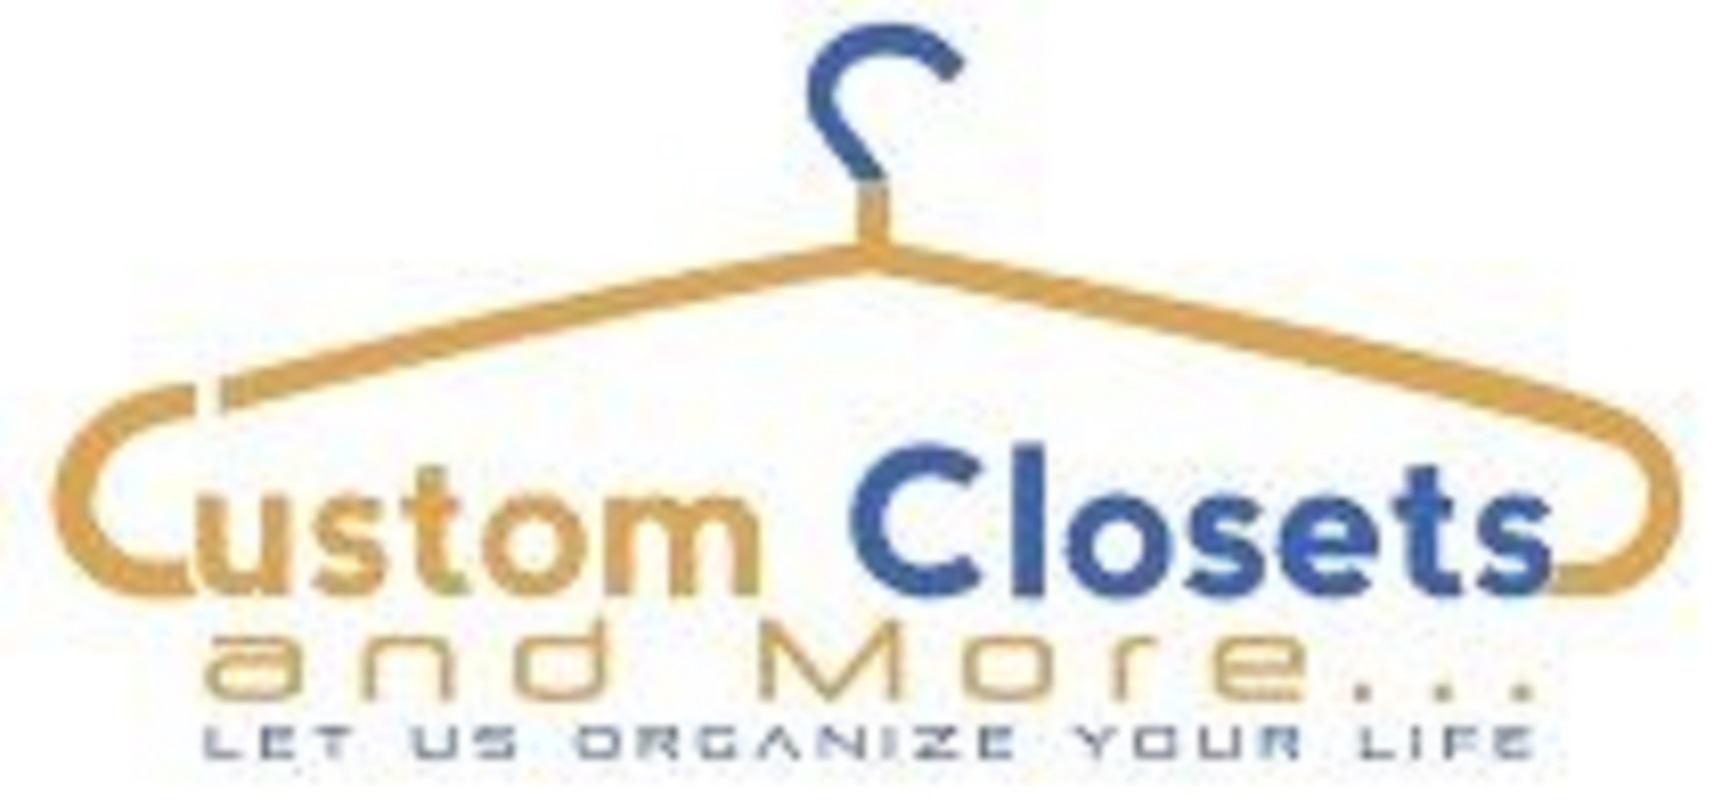 Custom Closet NYC